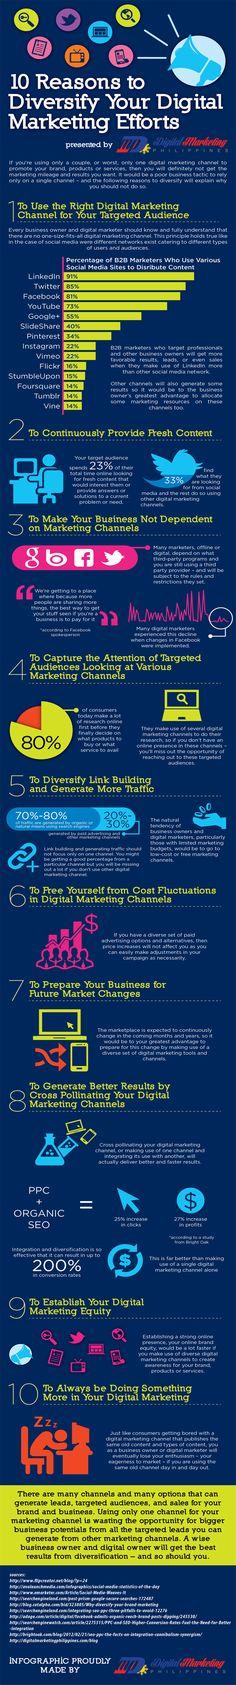 In B2B Linkedin still wins  | 10 Reasons to Diversify Your #DigitalMarketing Efforts